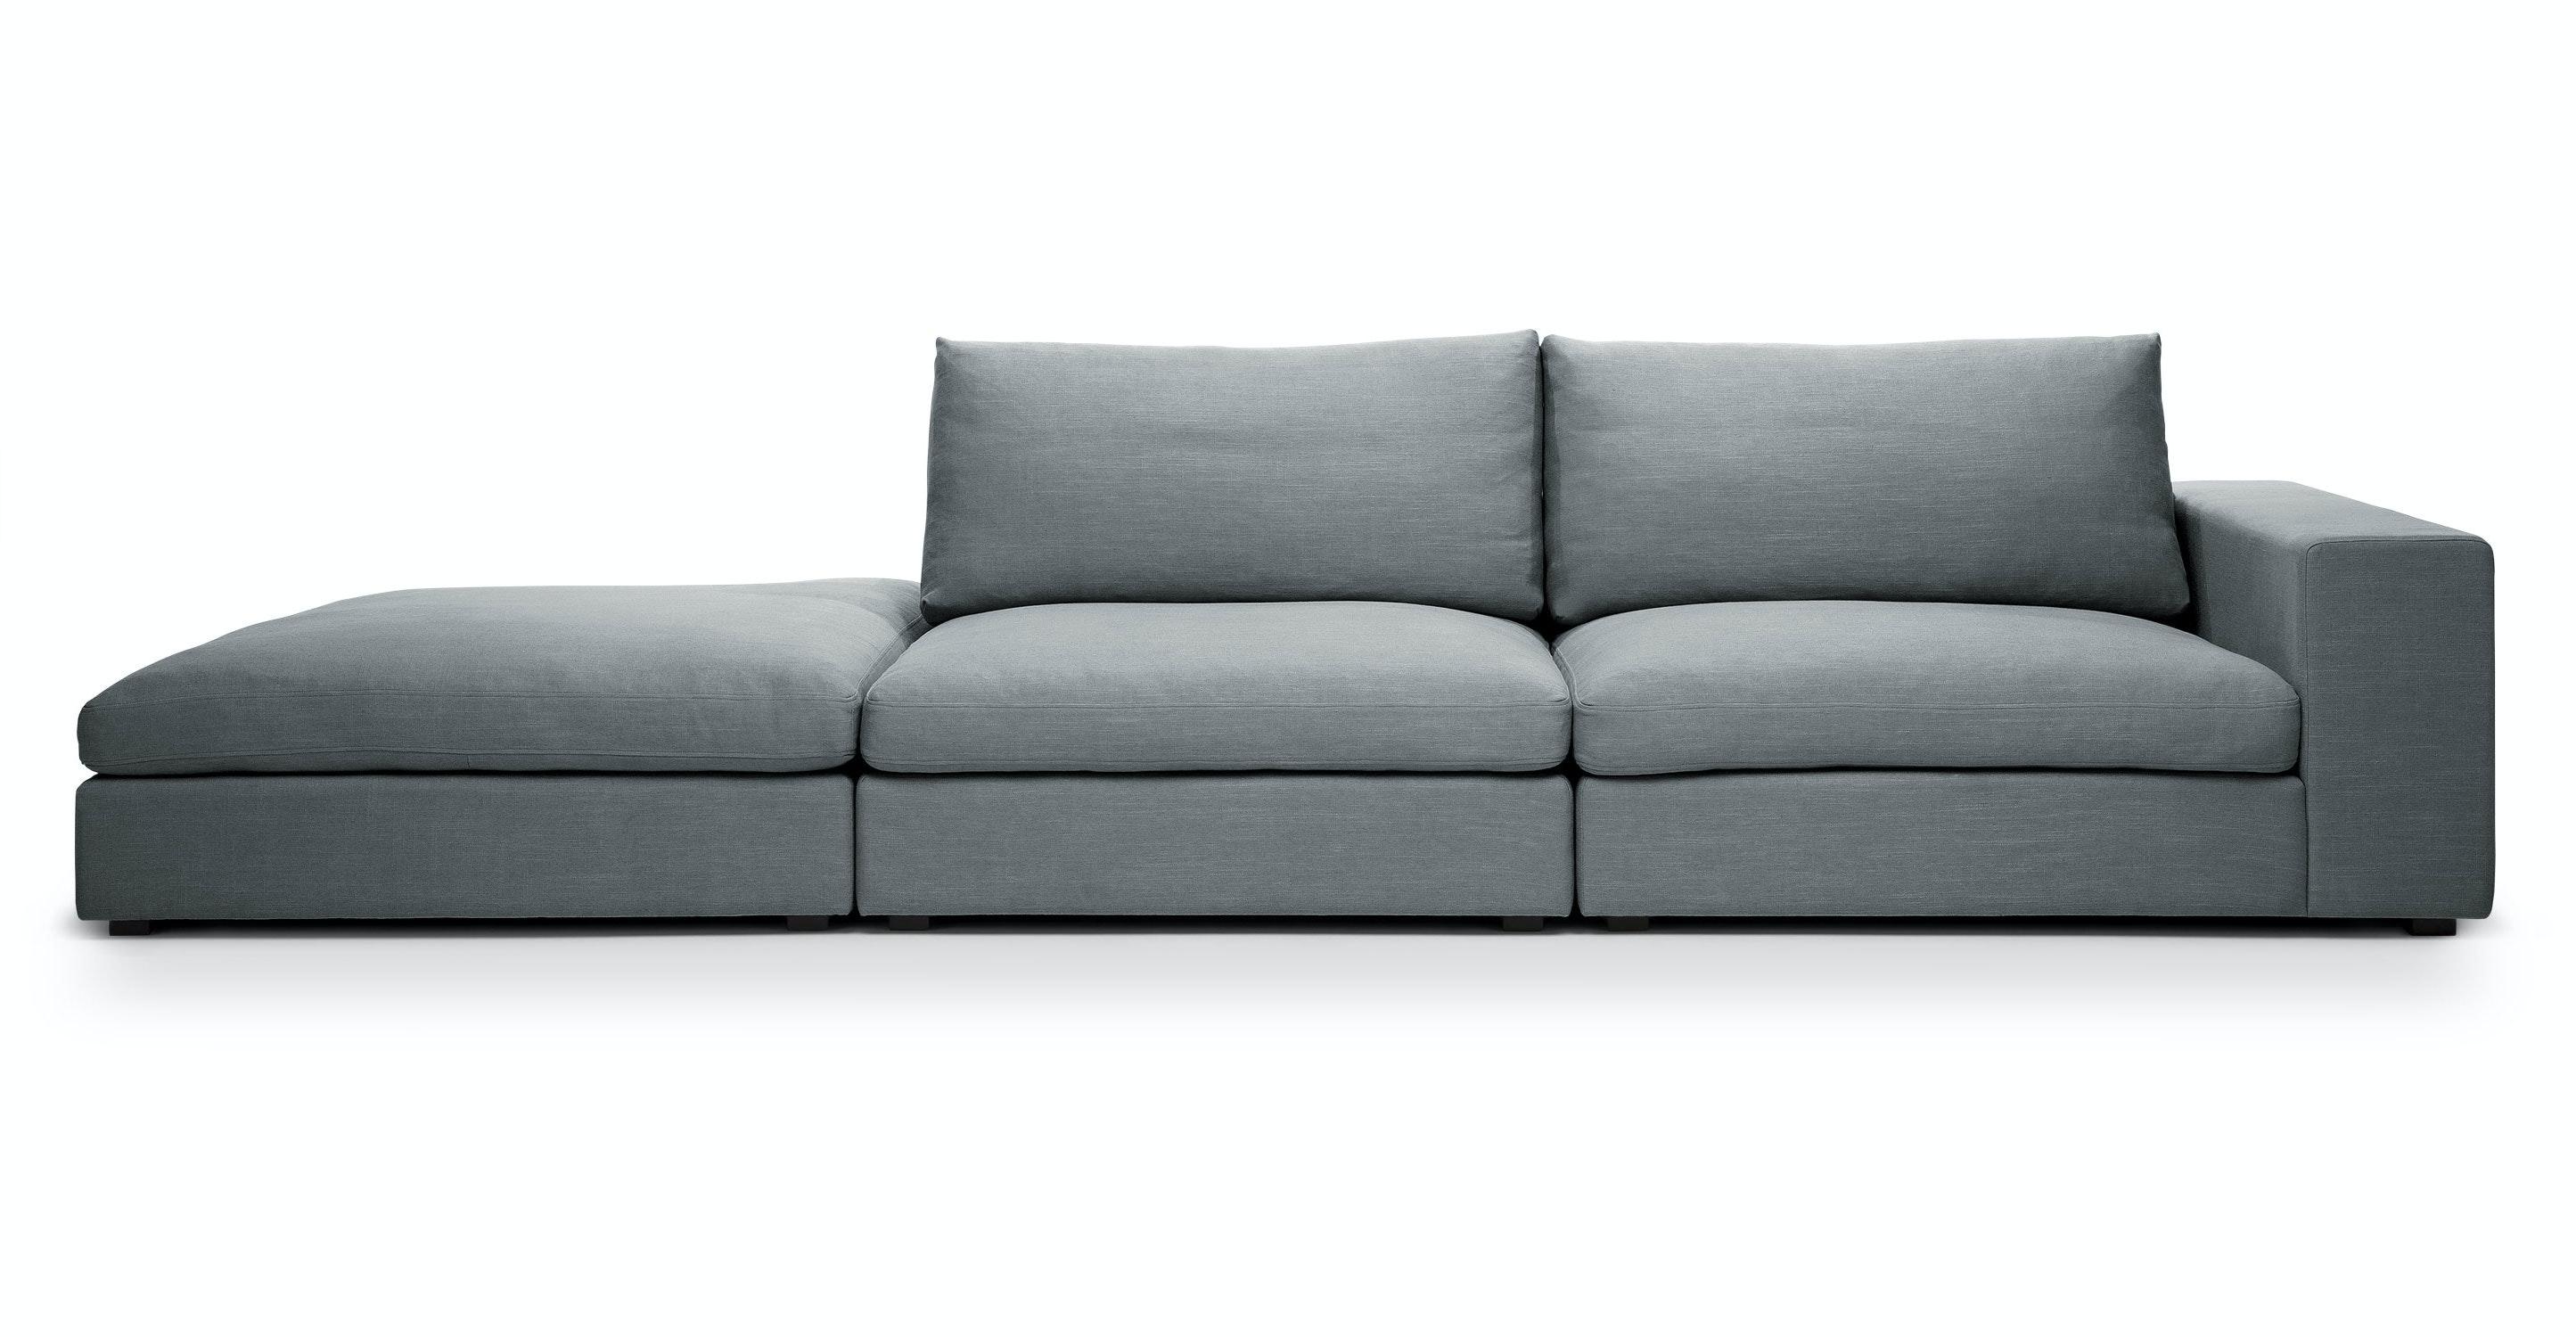 Cube Quartz White Modular Sofa Right Arm Sofas Article